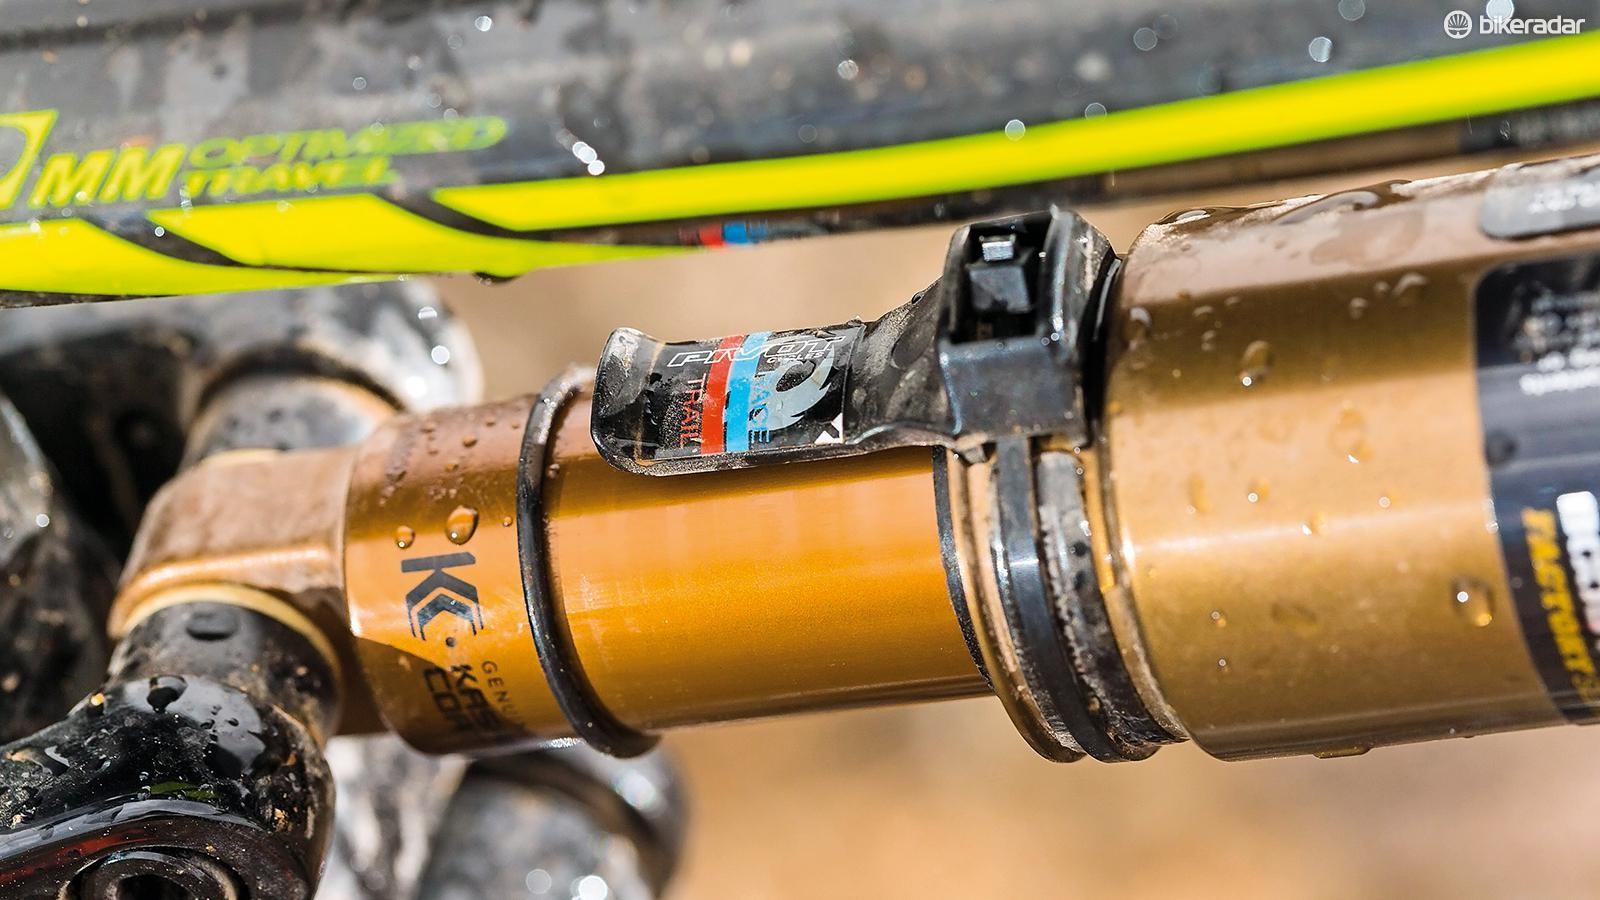 A nifty sag indicator simplifies setup  of the 115mm rear travel